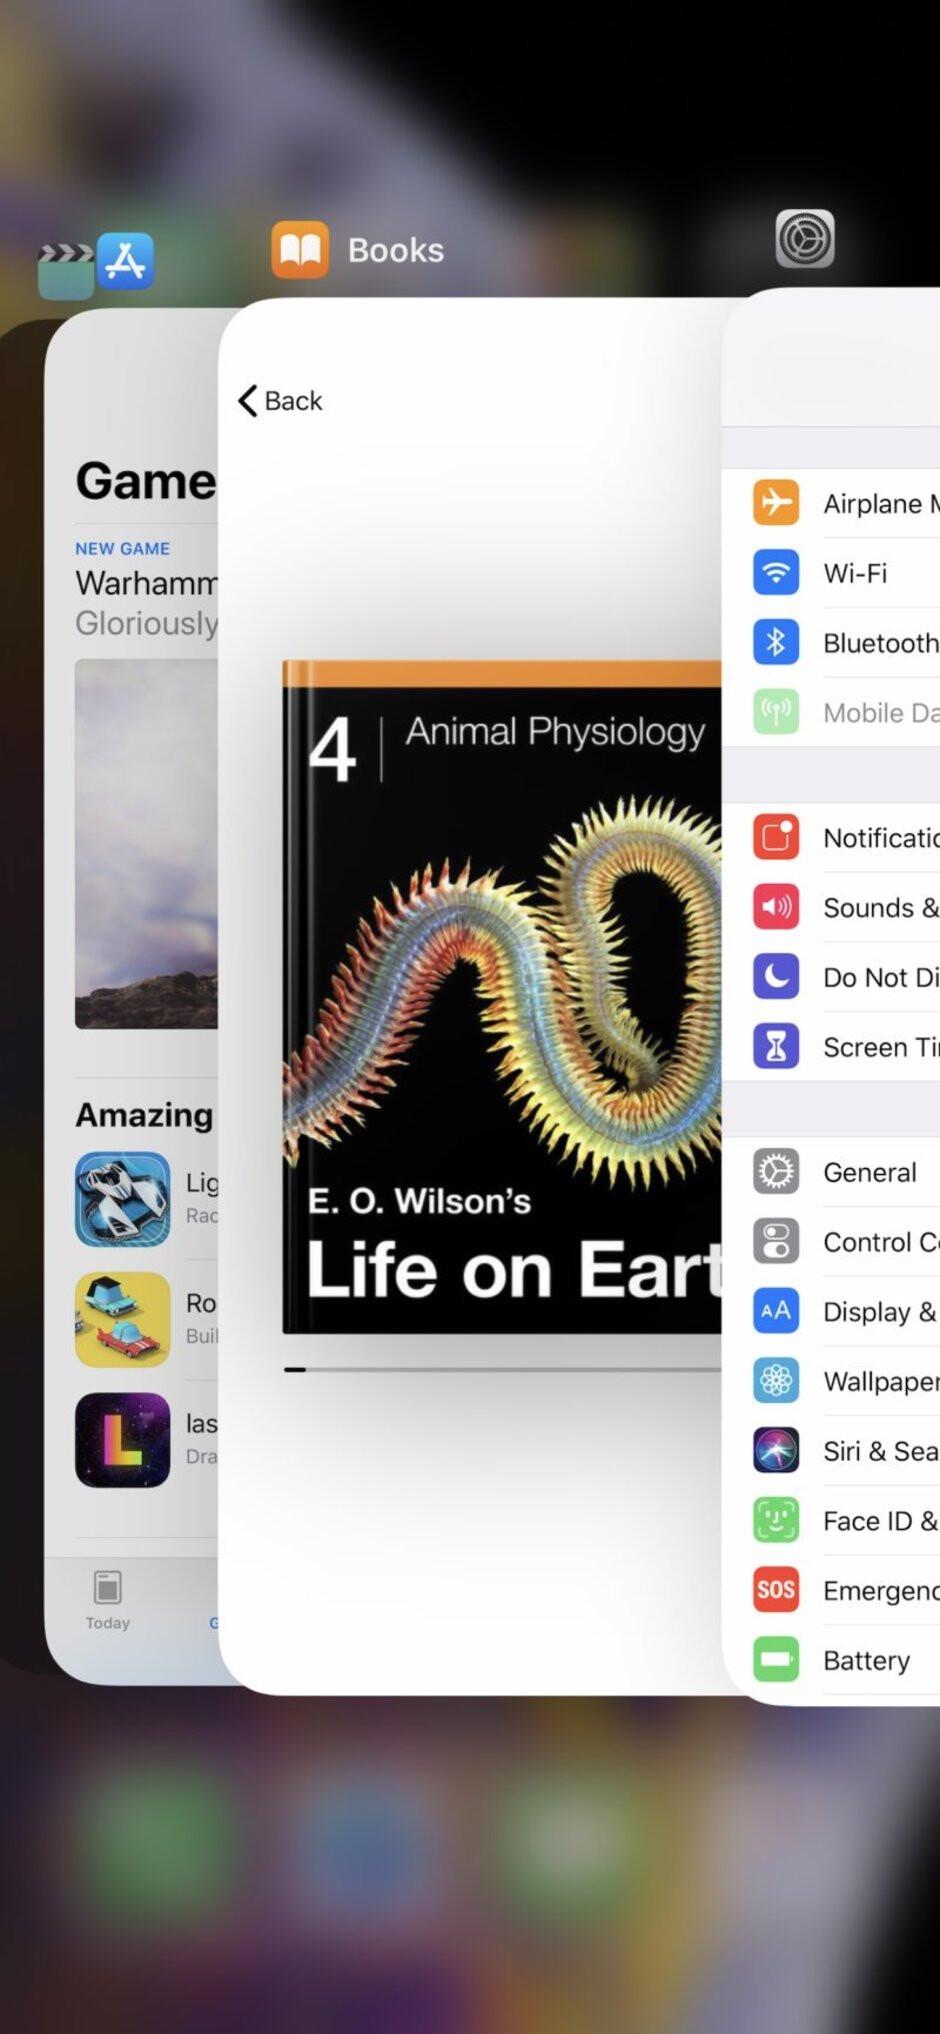 iOS 12 on the iPhone XS - Google Pixel 3 vs Apple iPhone XS